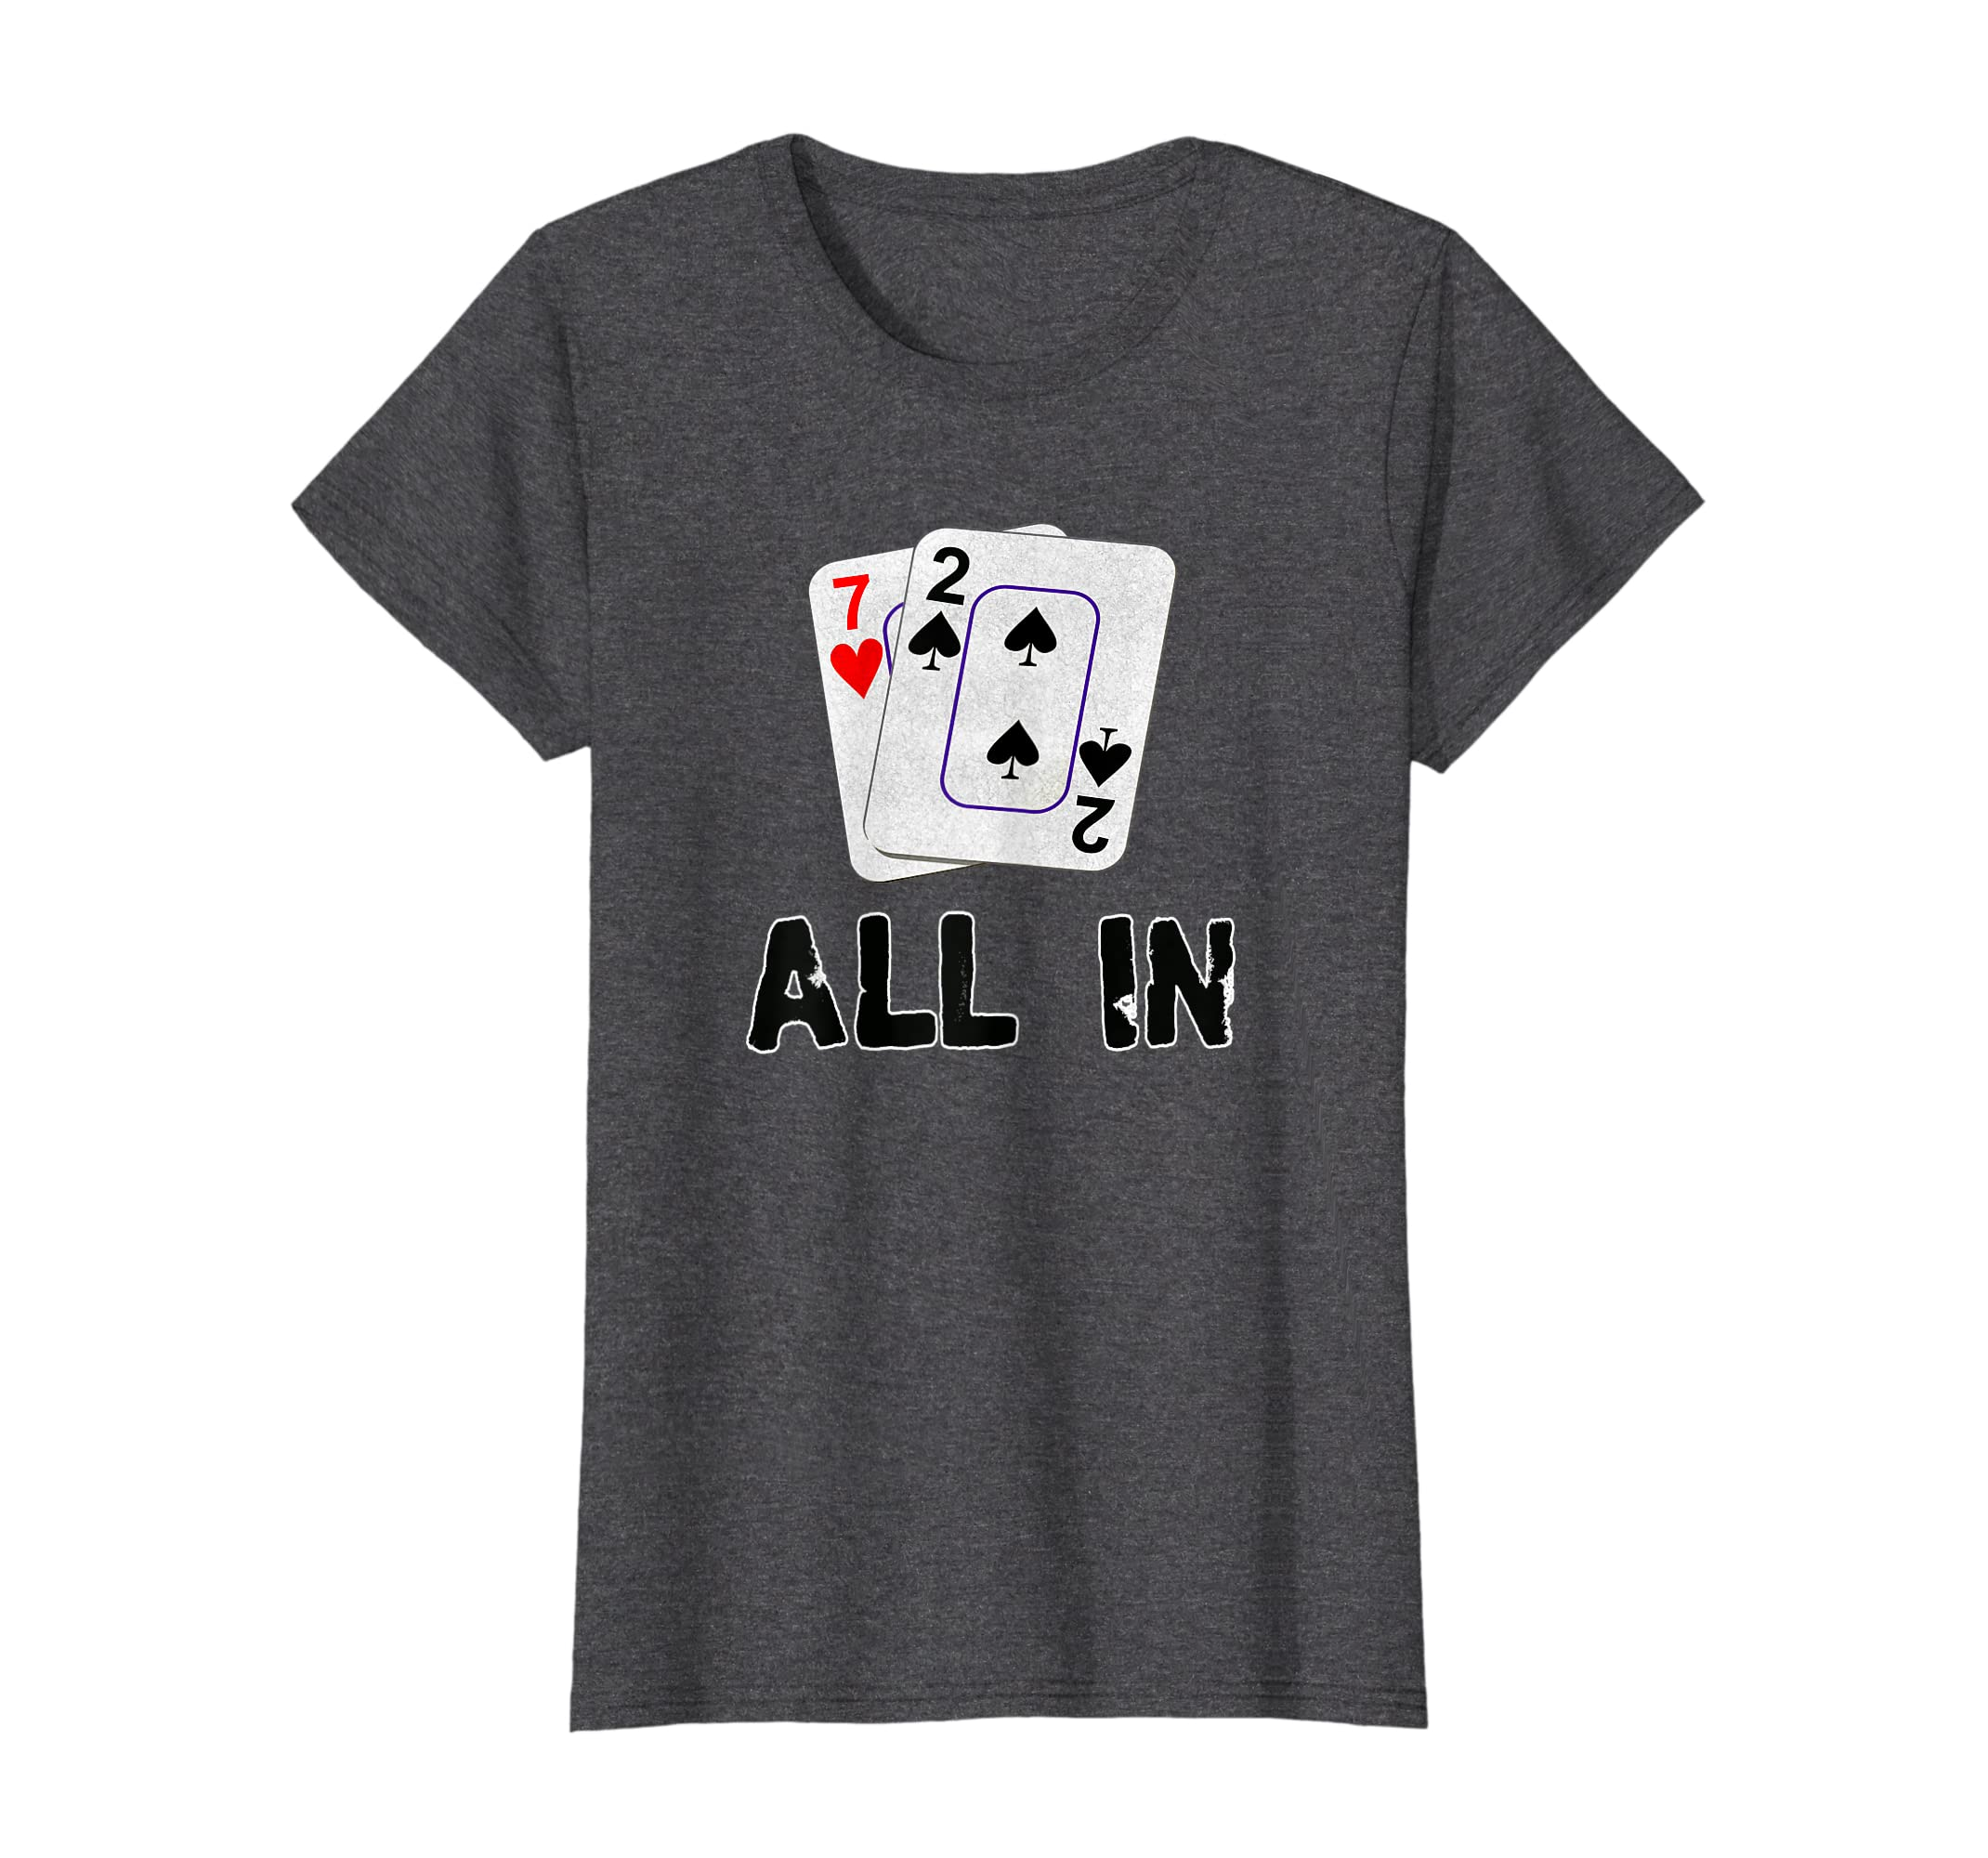 f85b443e9 Amazon.com: Seven Deuce All In Poker T Shirt - Texas Hold Em - Shove 7 2:  Clothing